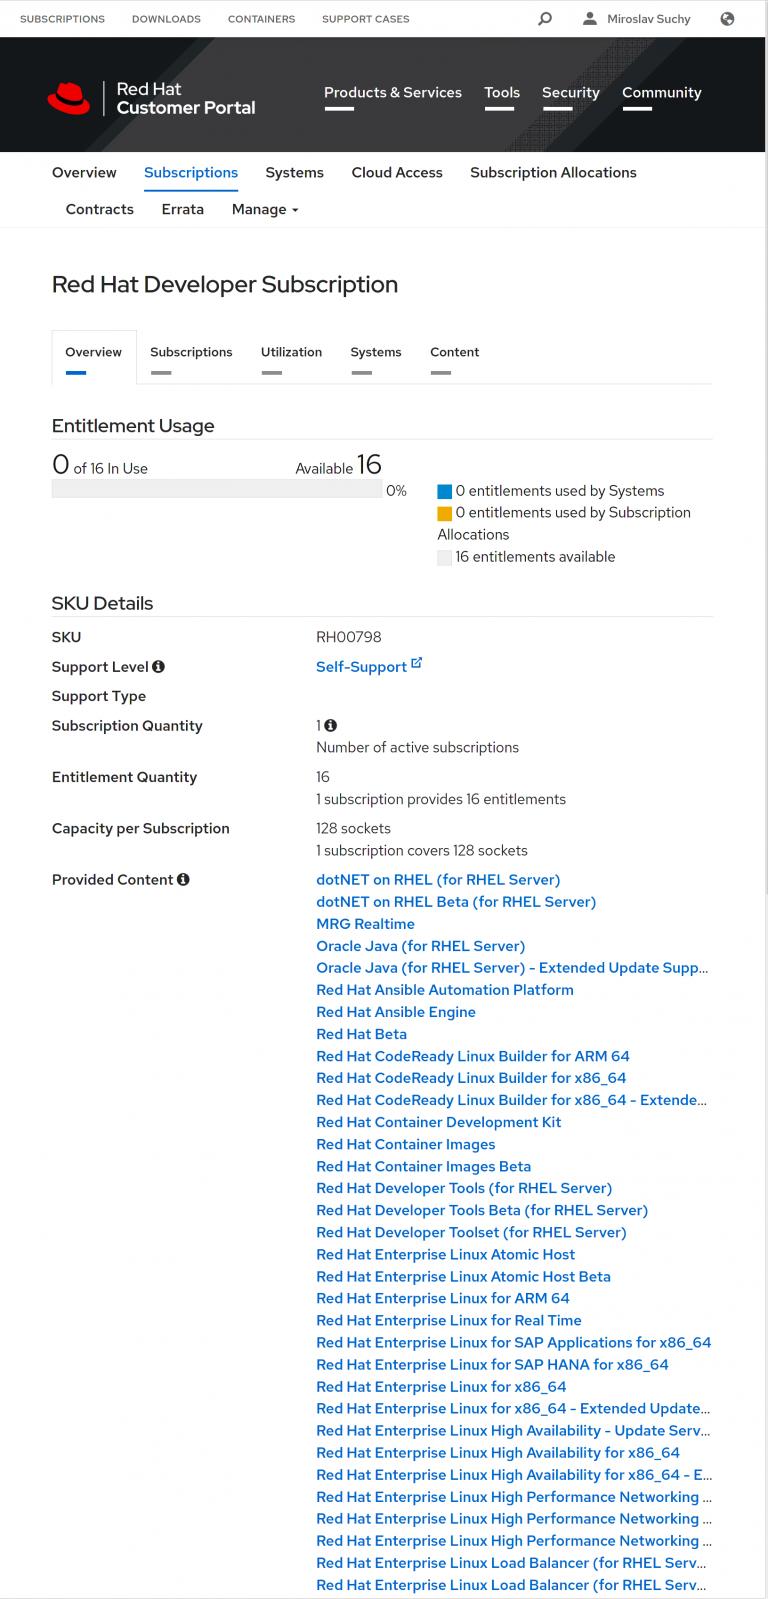 Screenshot of Subscription detail